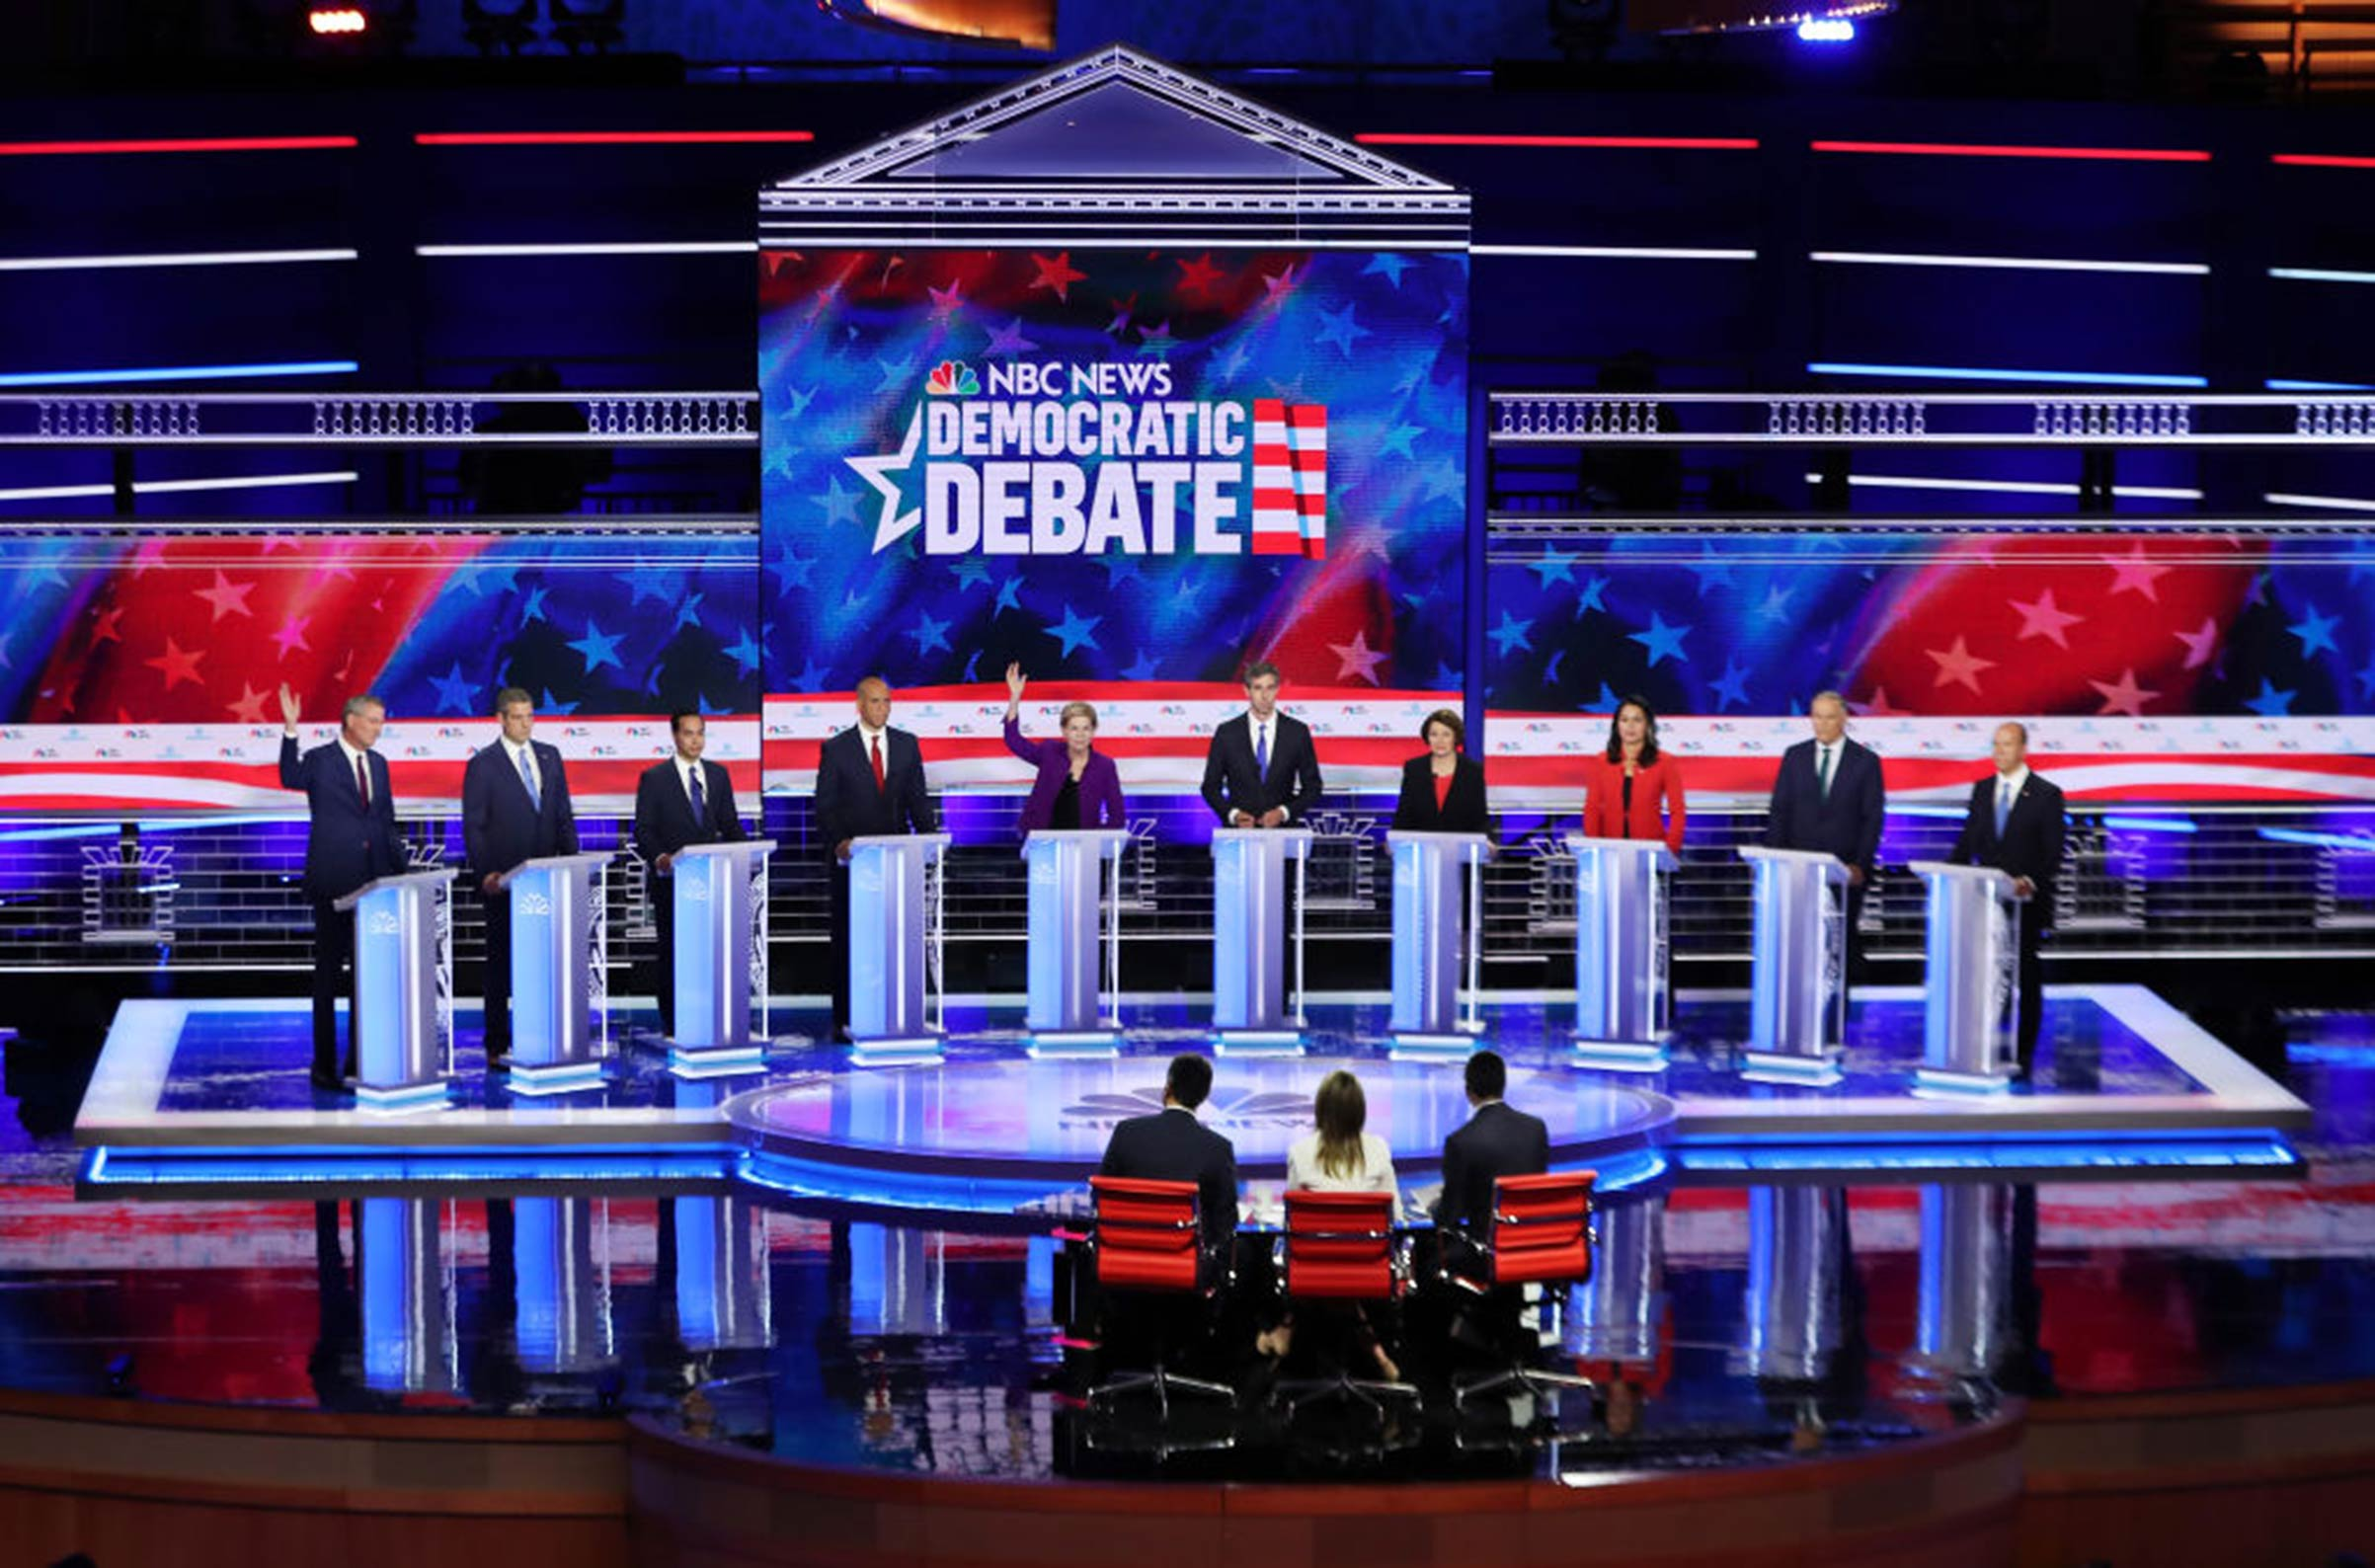 Democratic presidential candidates New York City Mayor Bill De Blasio (L-R), Rep. Tim Ryan (D-OH), former housing secretary Julian Castro, Sen. Cory Booker (D-NJ), Sen. Elizabeth Warren (D-MA), former Texas congressman Beto O'Rourke, Sen. Amy Klobuchar (D-MN), Rep. Tulsi Gabbard (D-HI), Washington Gov. Jay Inslee, and former Maryland congressman John Delaney take part in the first Democratic presidential debate on June 26, 2019 in Miami.